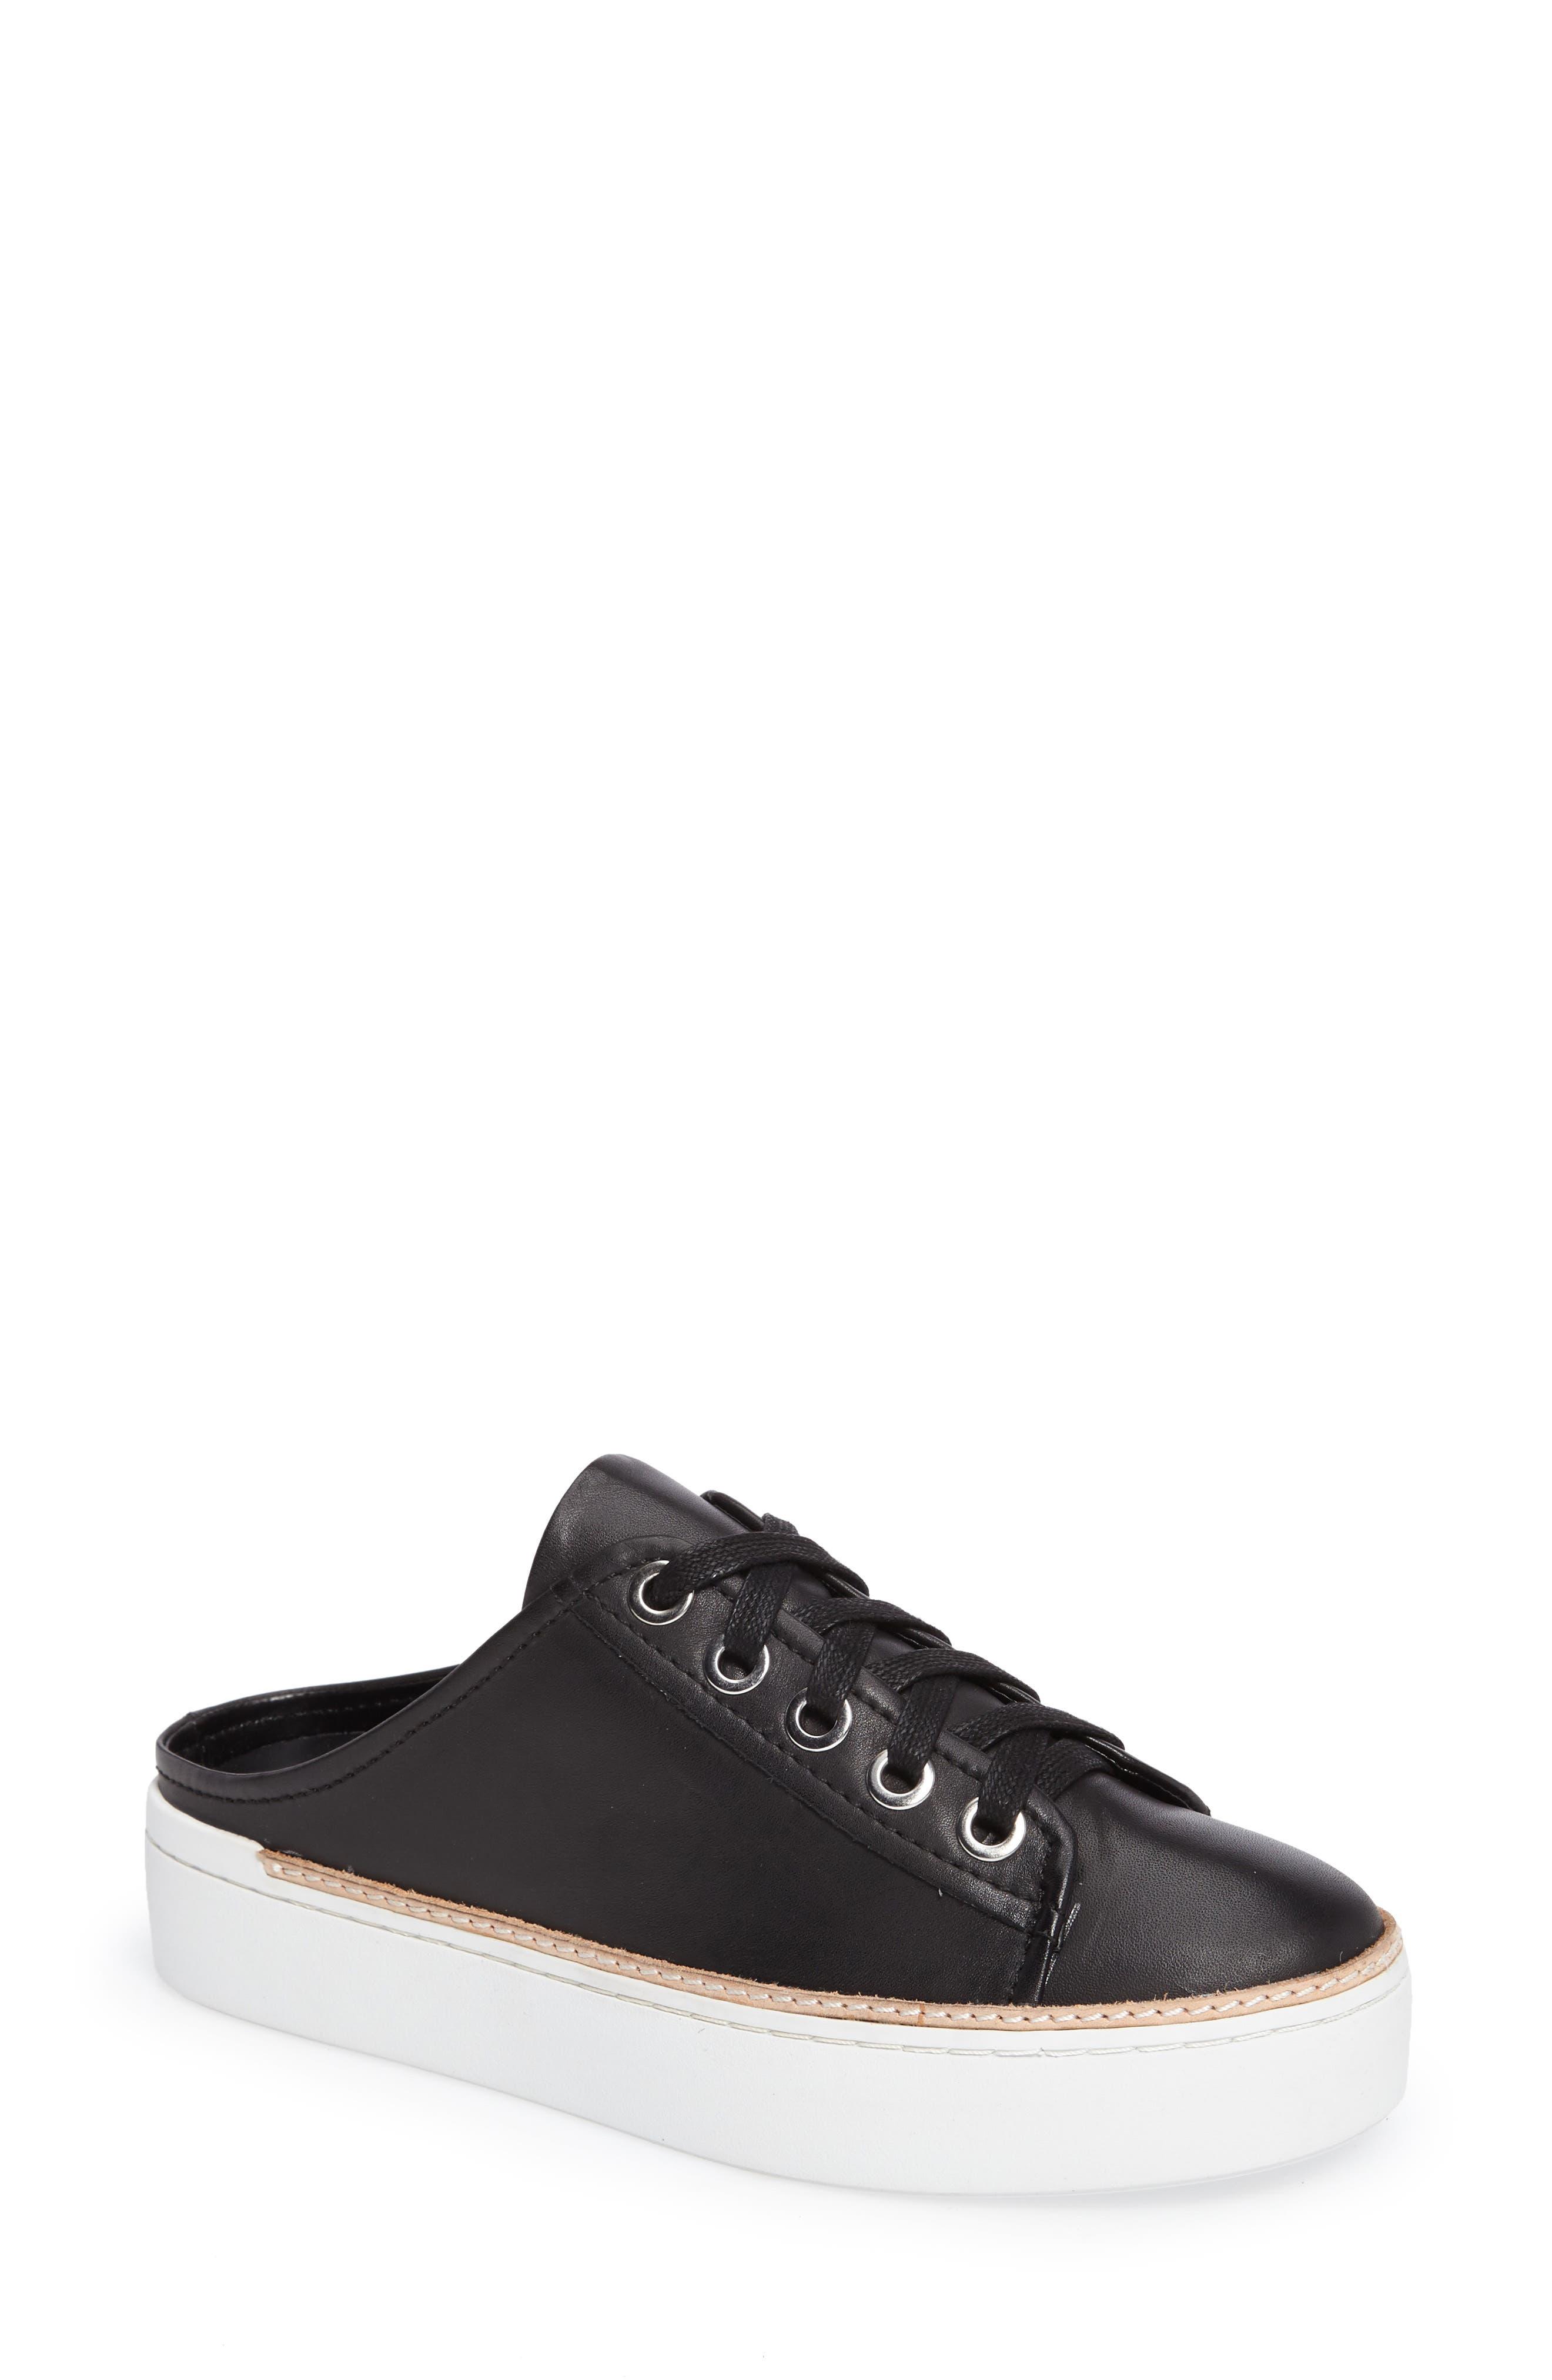 M4D3 Slide Platform Sneaker,                             Main thumbnail 1, color,                             Black